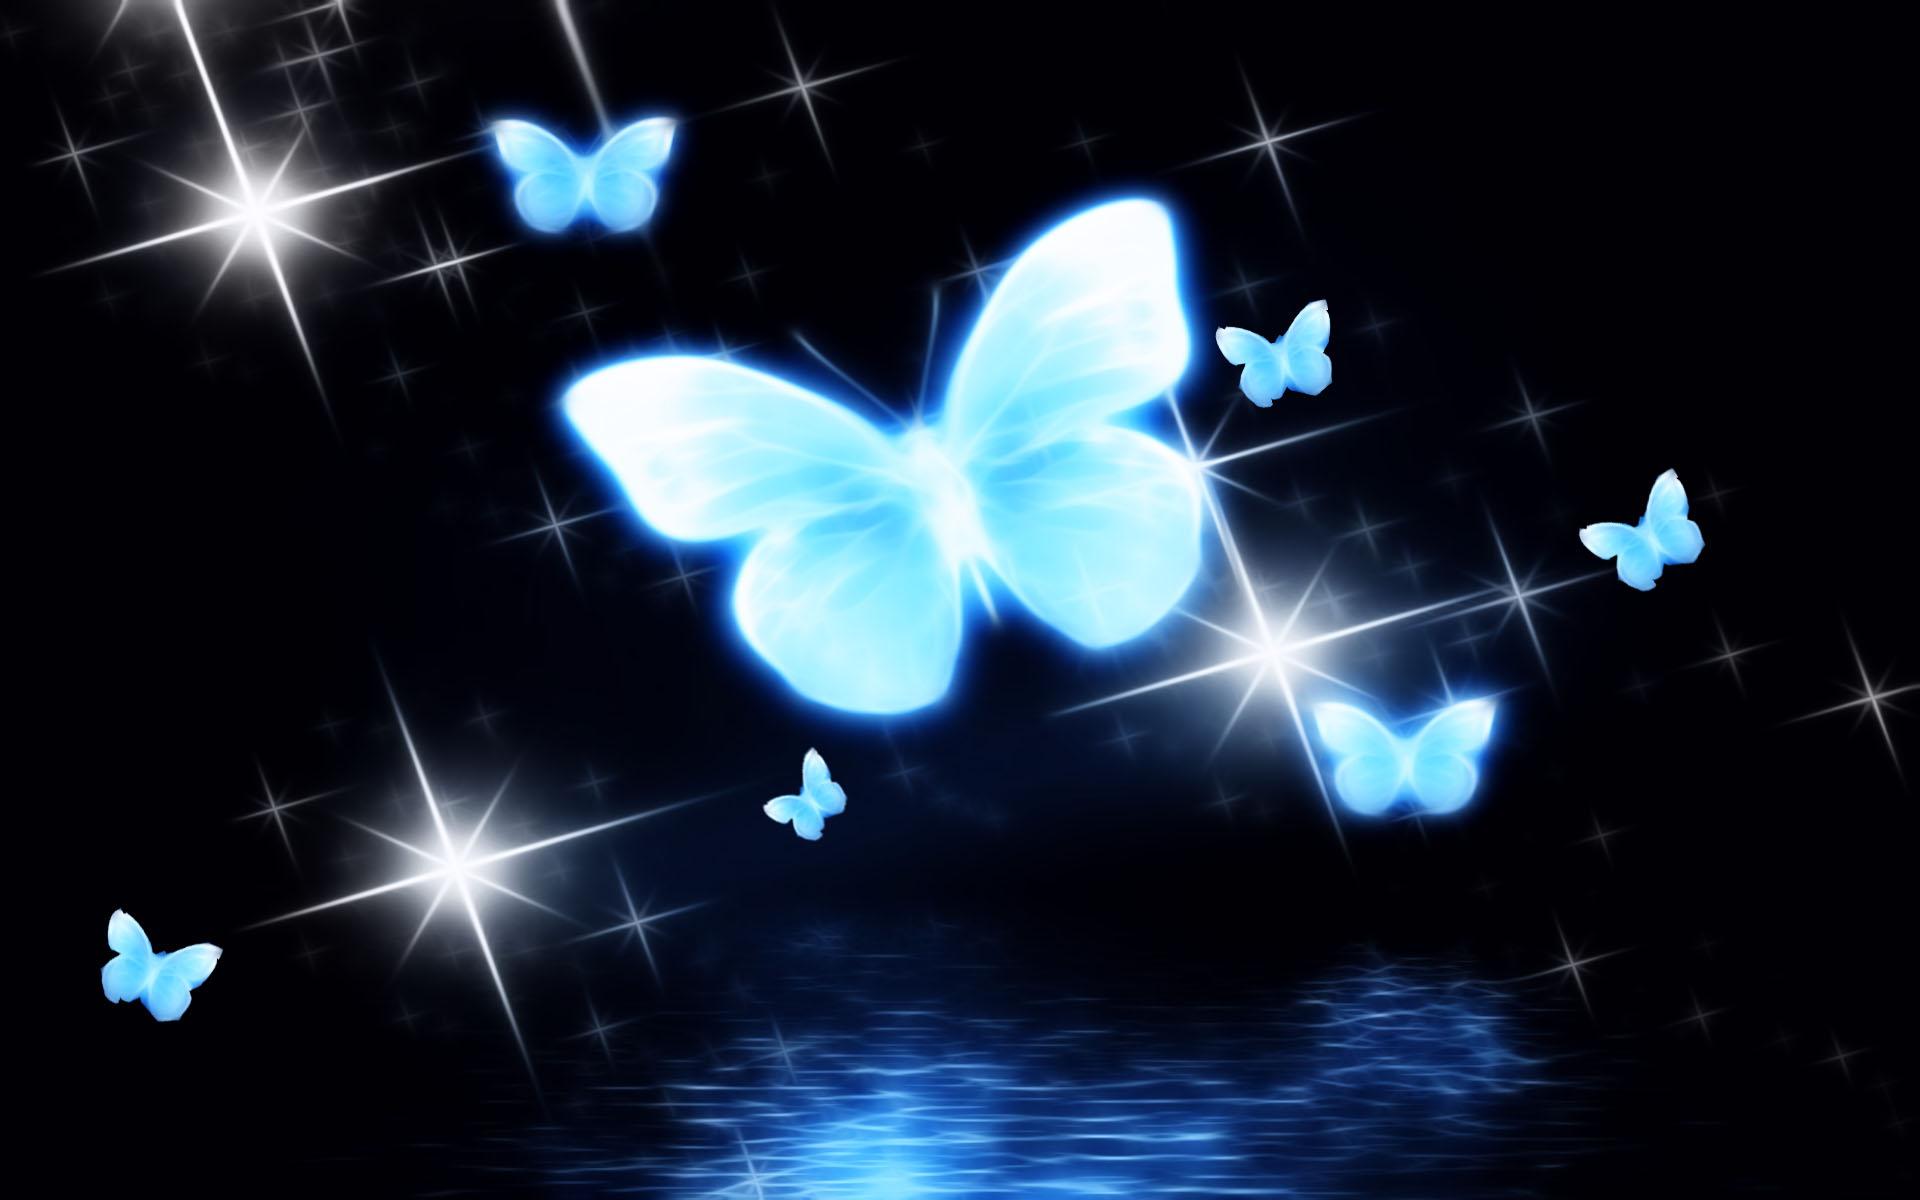 Neon Blue Butterflies Hd Wallpaper Background Image 1920x1200